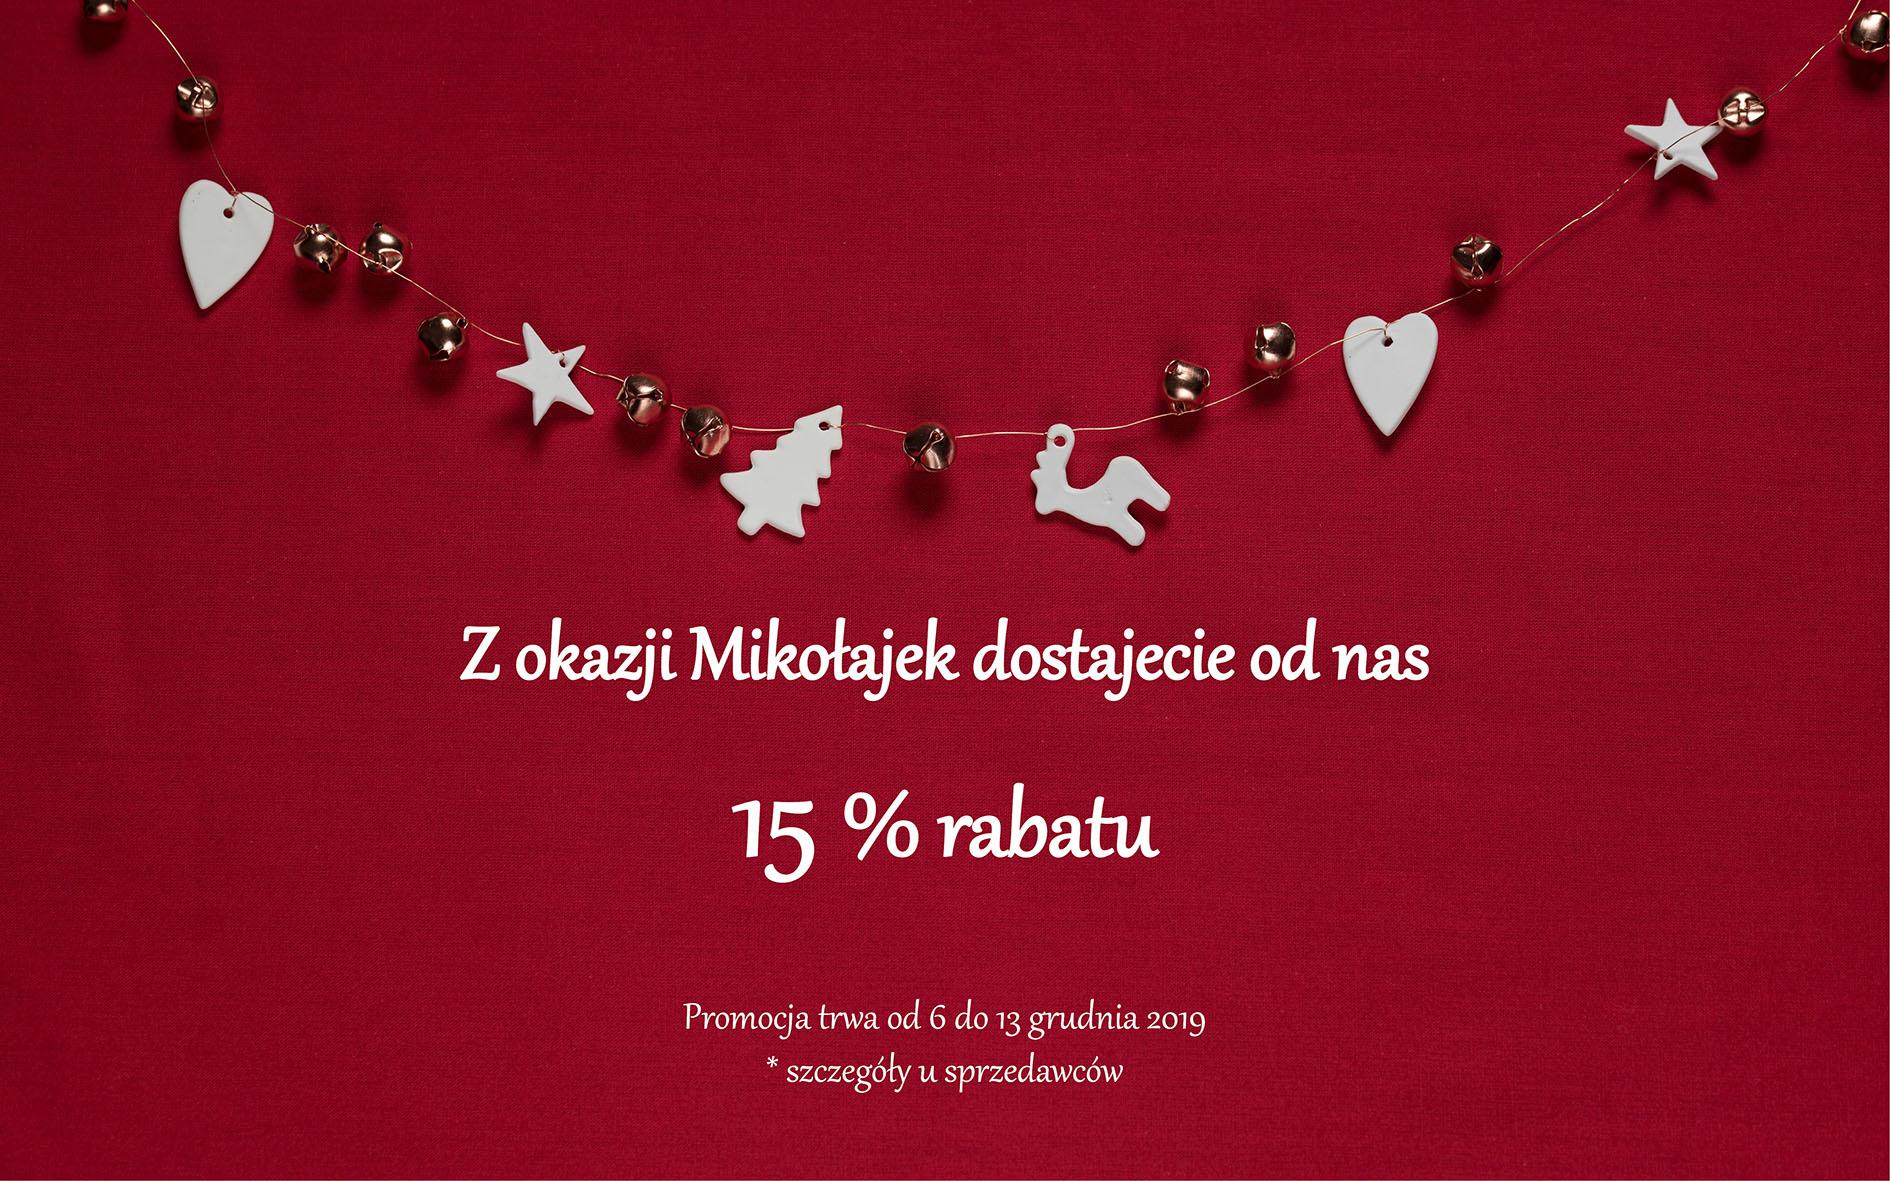 Tobo_Producent_mebli_promocja_mikolajki.jpg